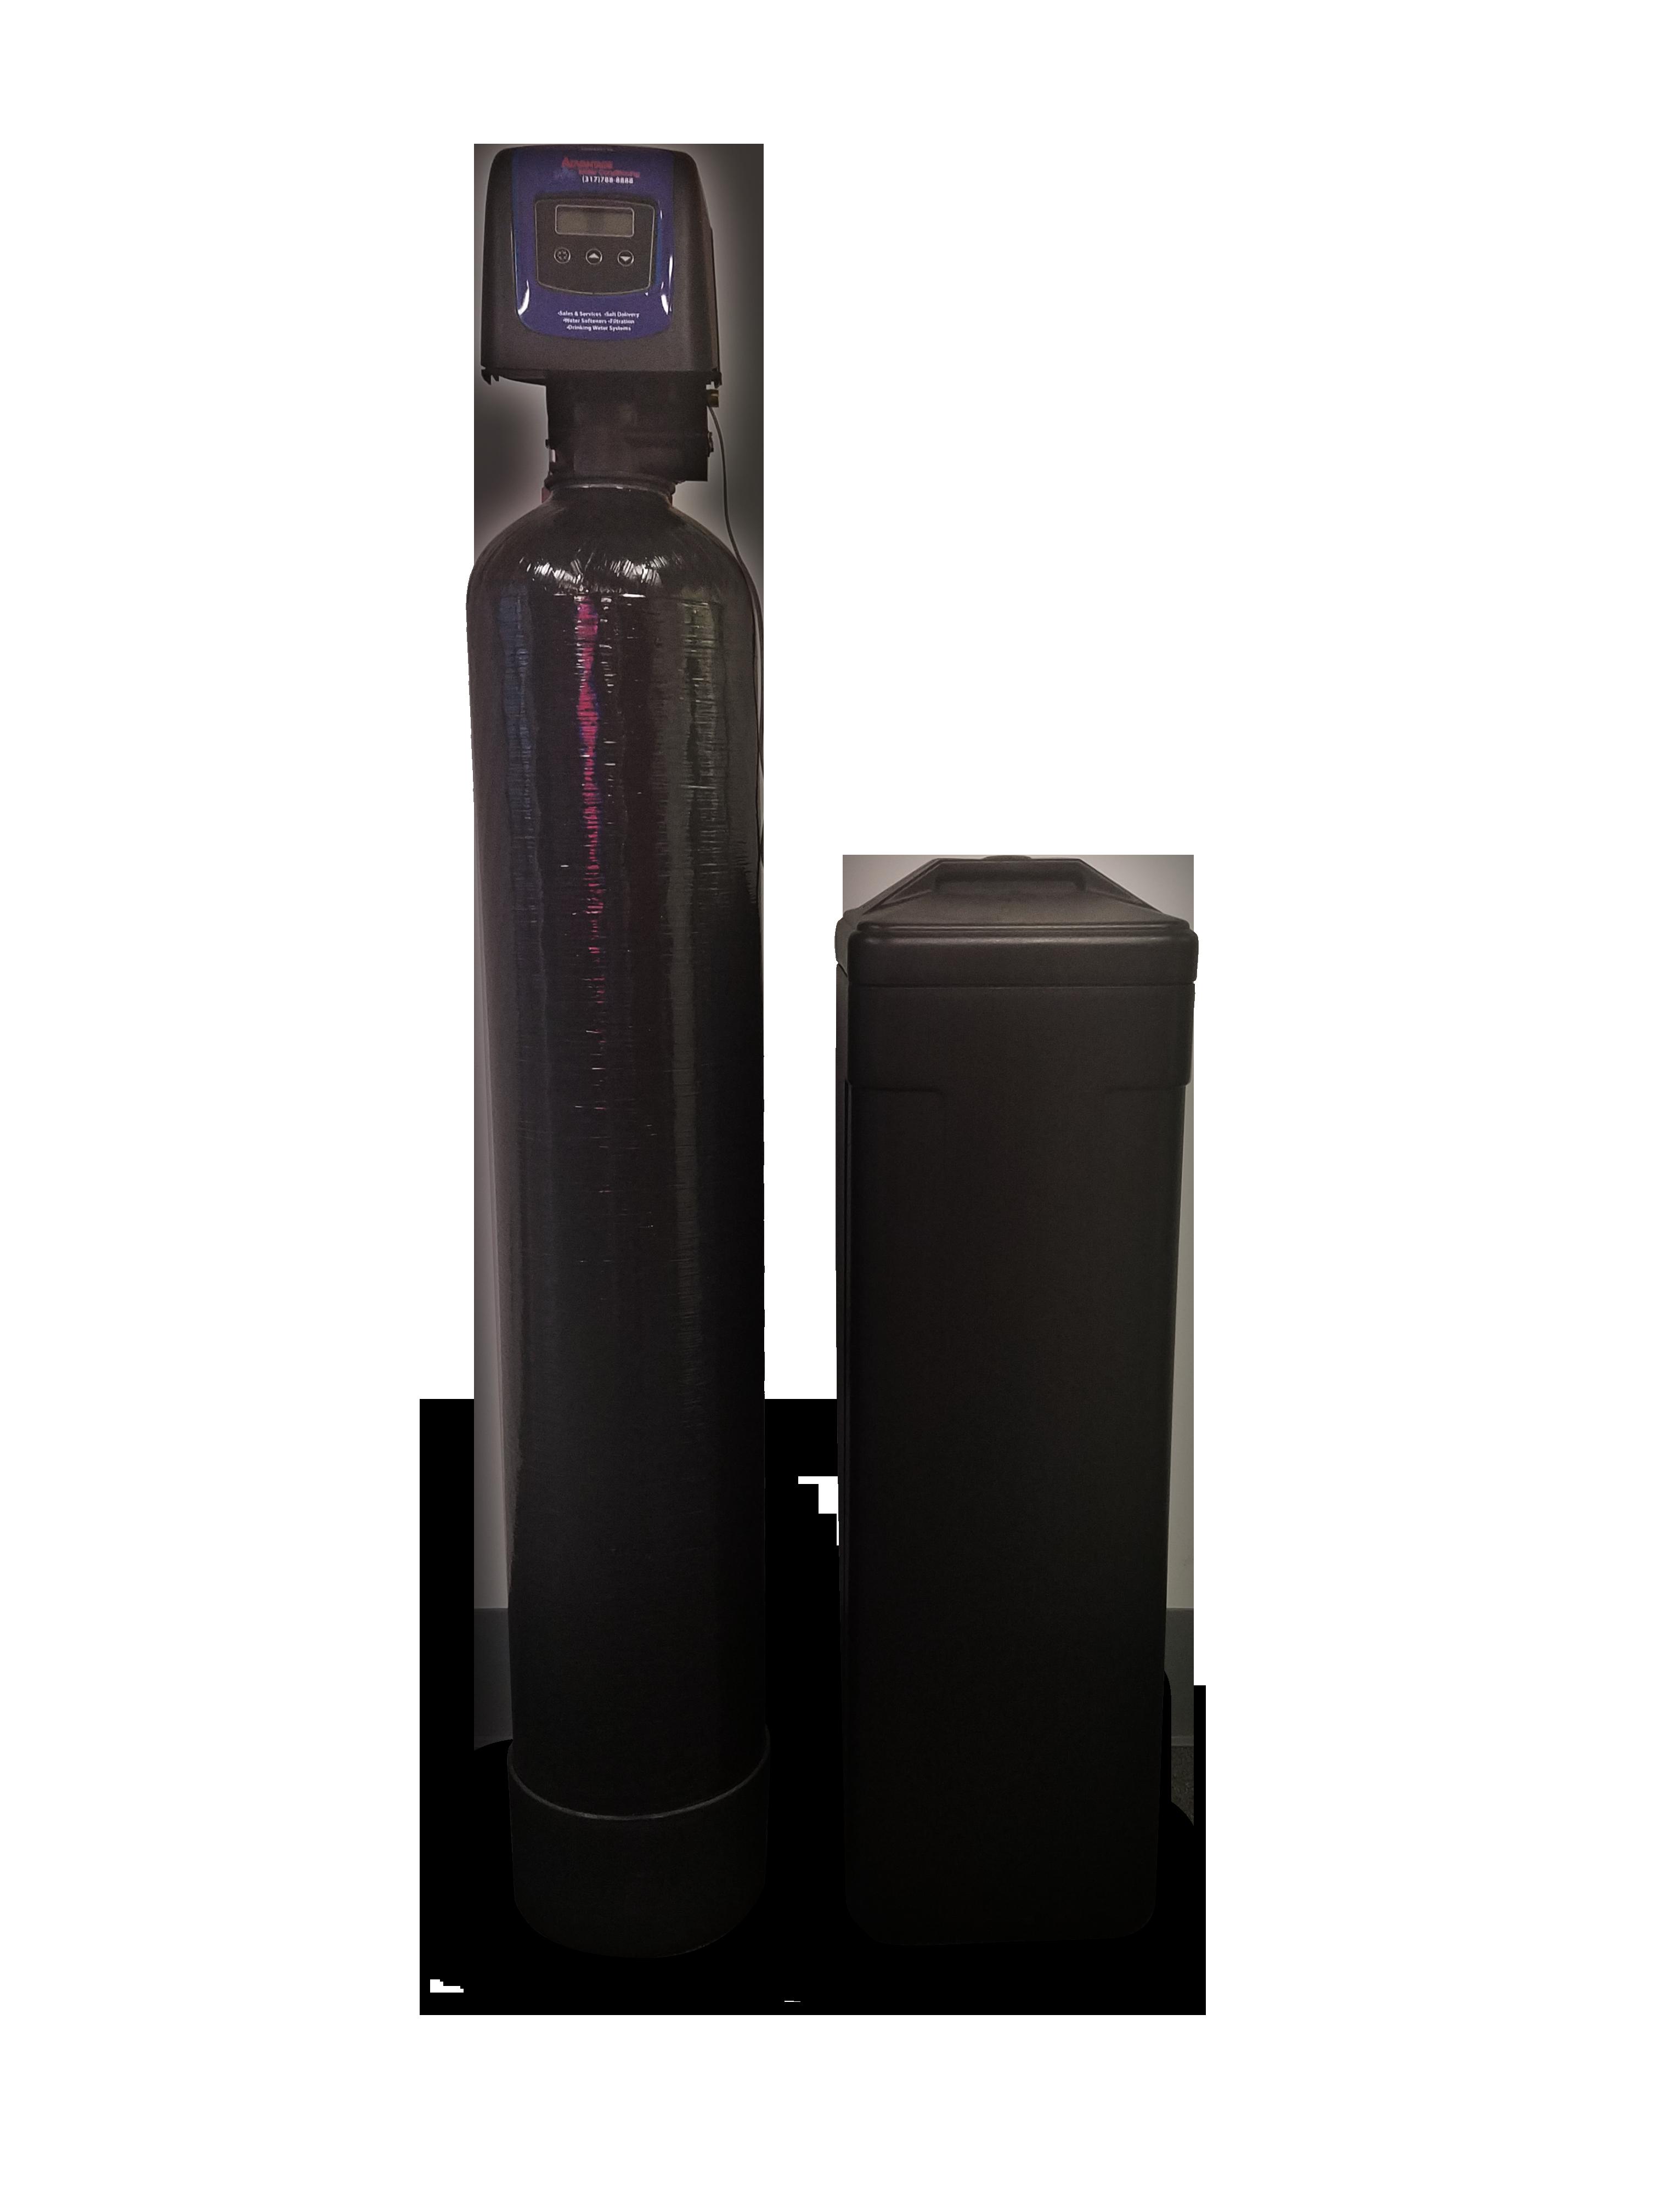 L1 Softener-isolated-nobg